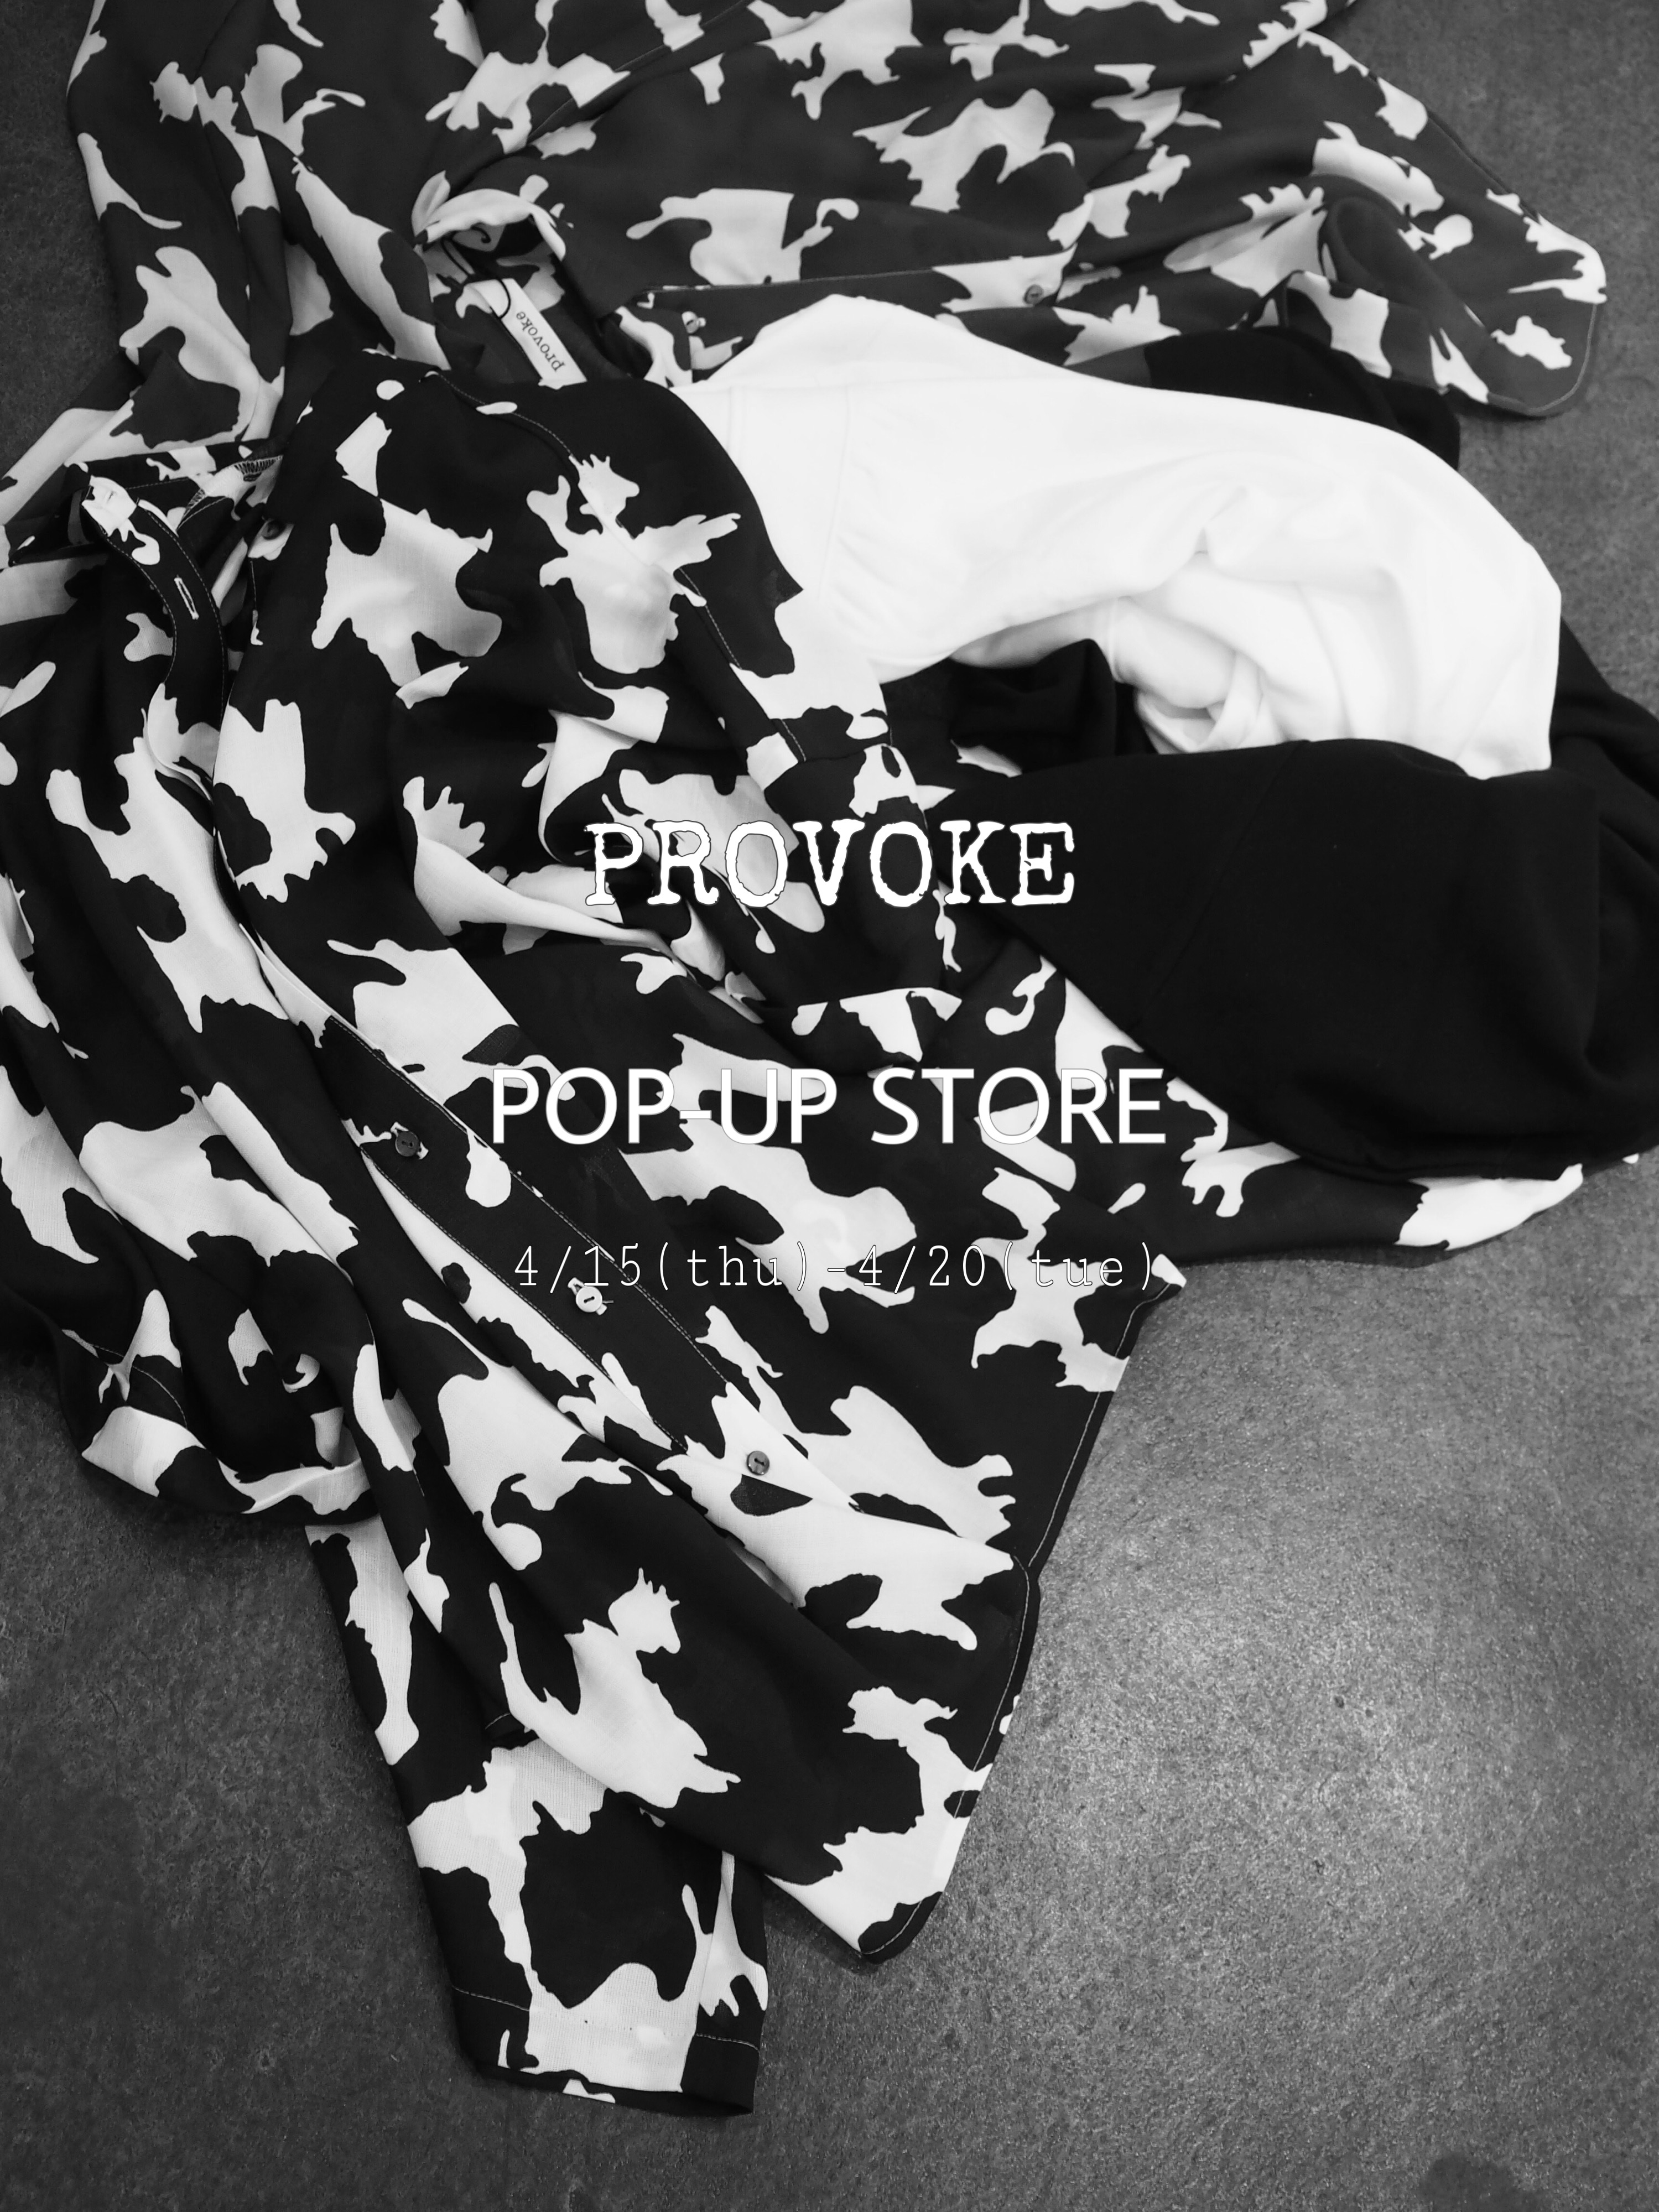 4/15(thu)-20(tue) PROVOKE POP-UP STORE